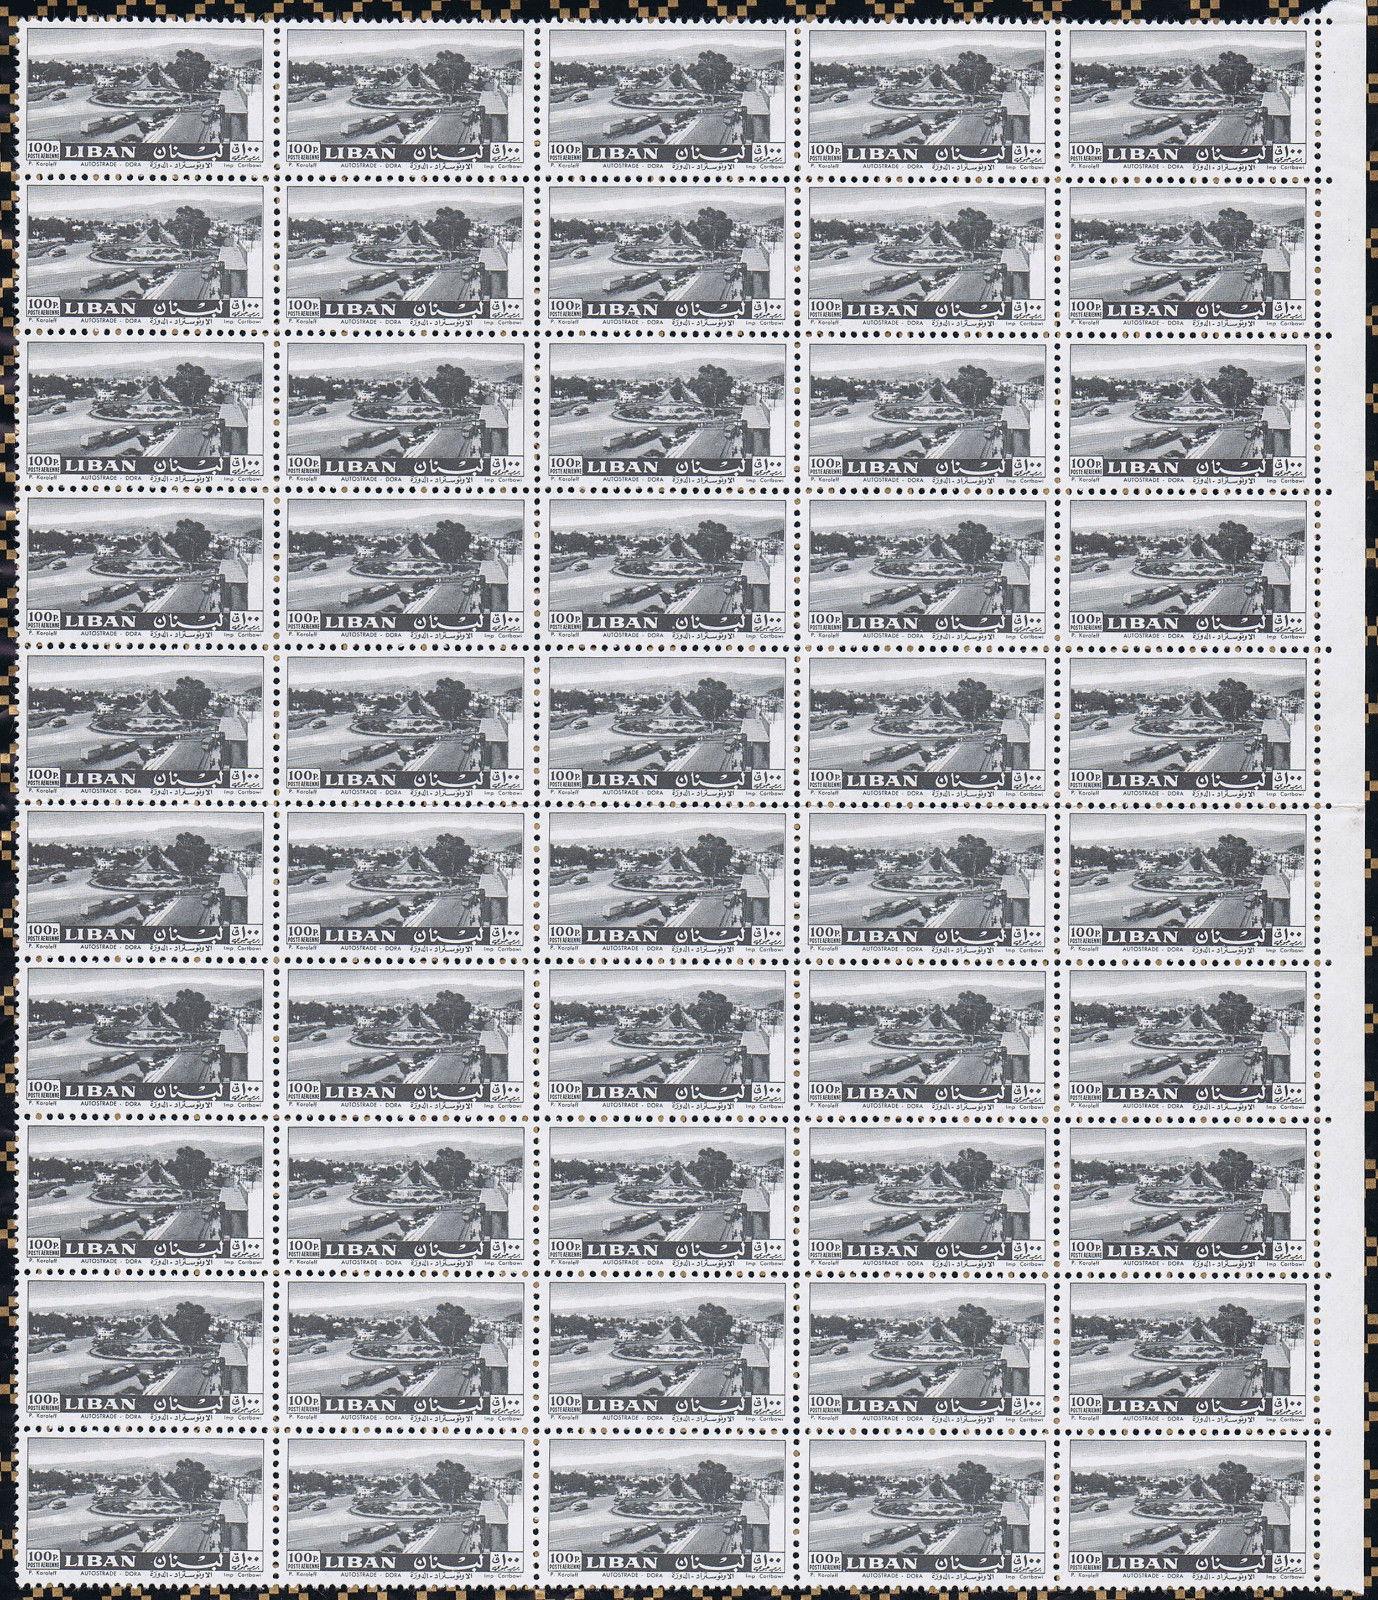 1961 Post Office Building Dawra 100p -  291134731651